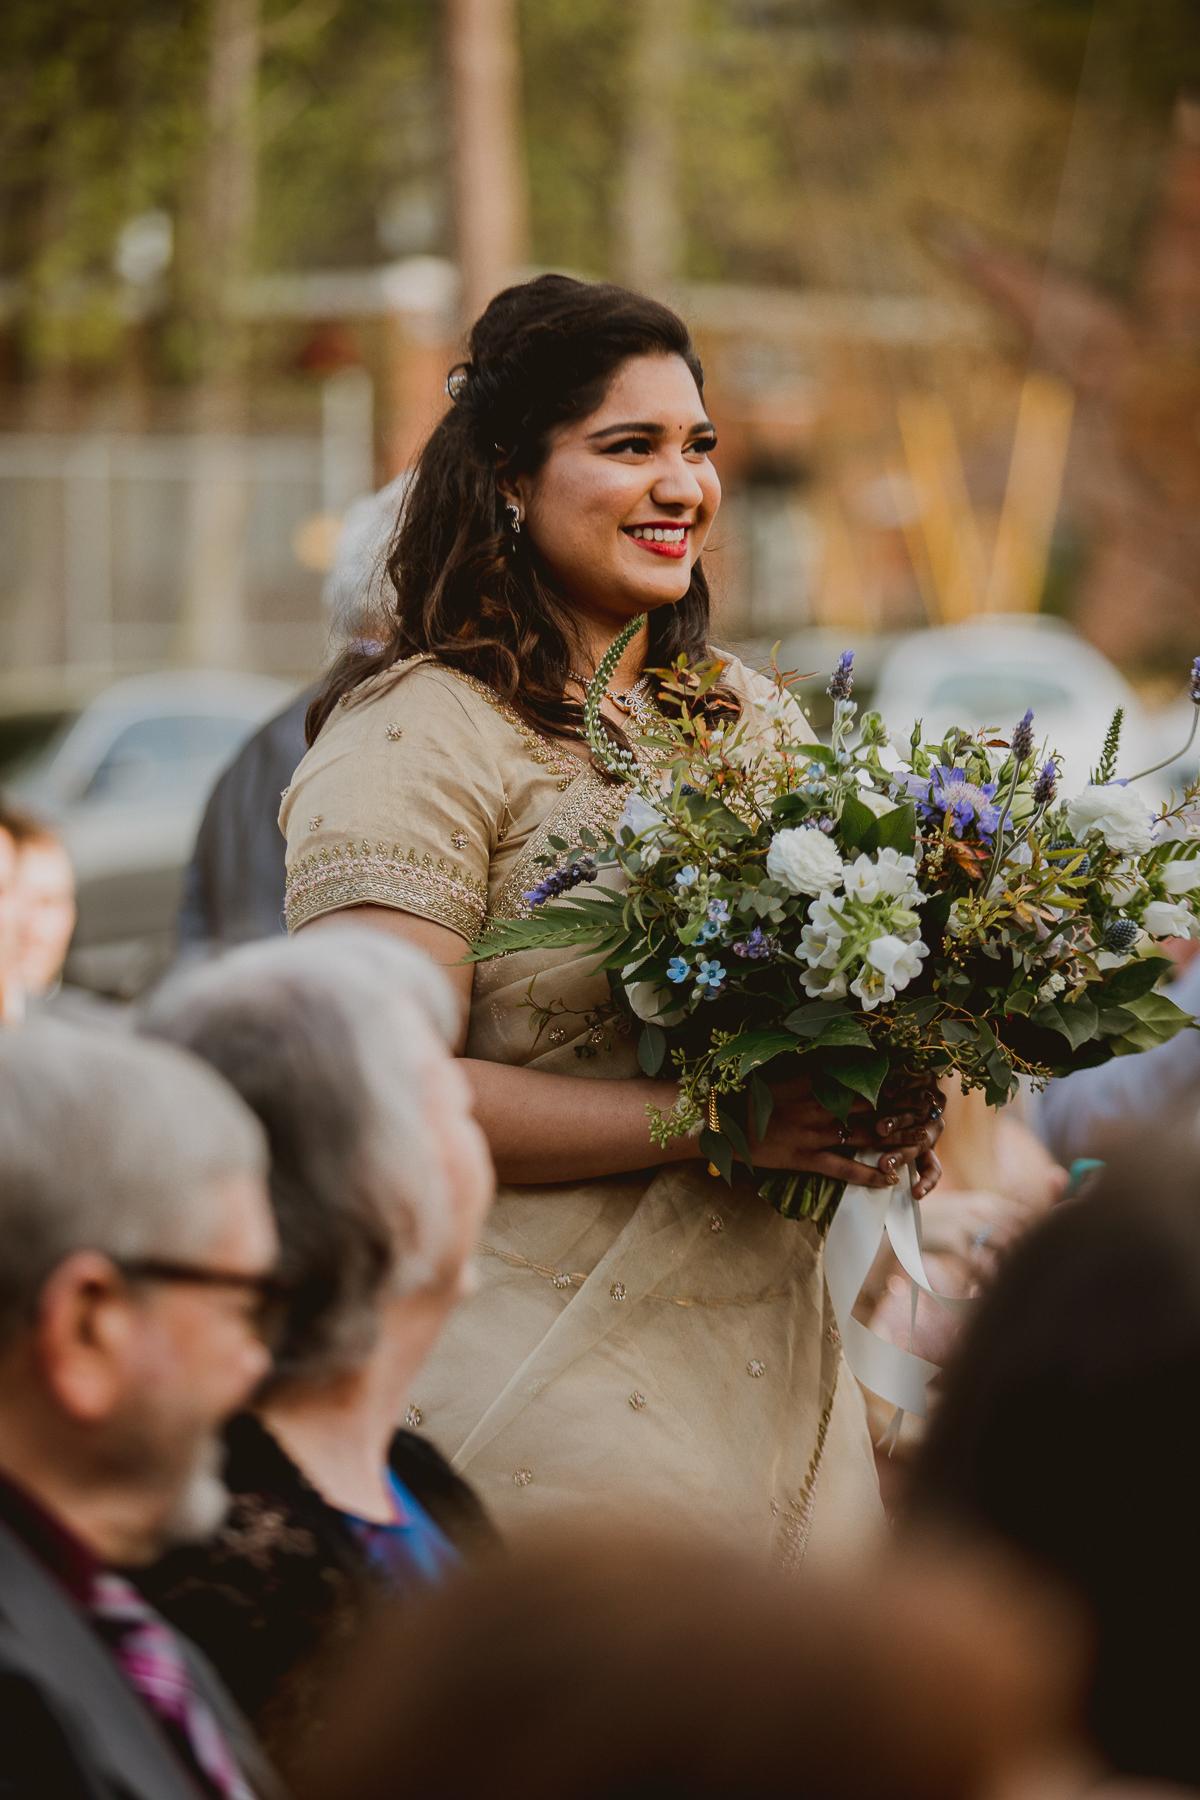 eventide-brewery-indian-american-fusion-kelley-raye-atlanta-los-angeles-wedding-photographer-51.jpg